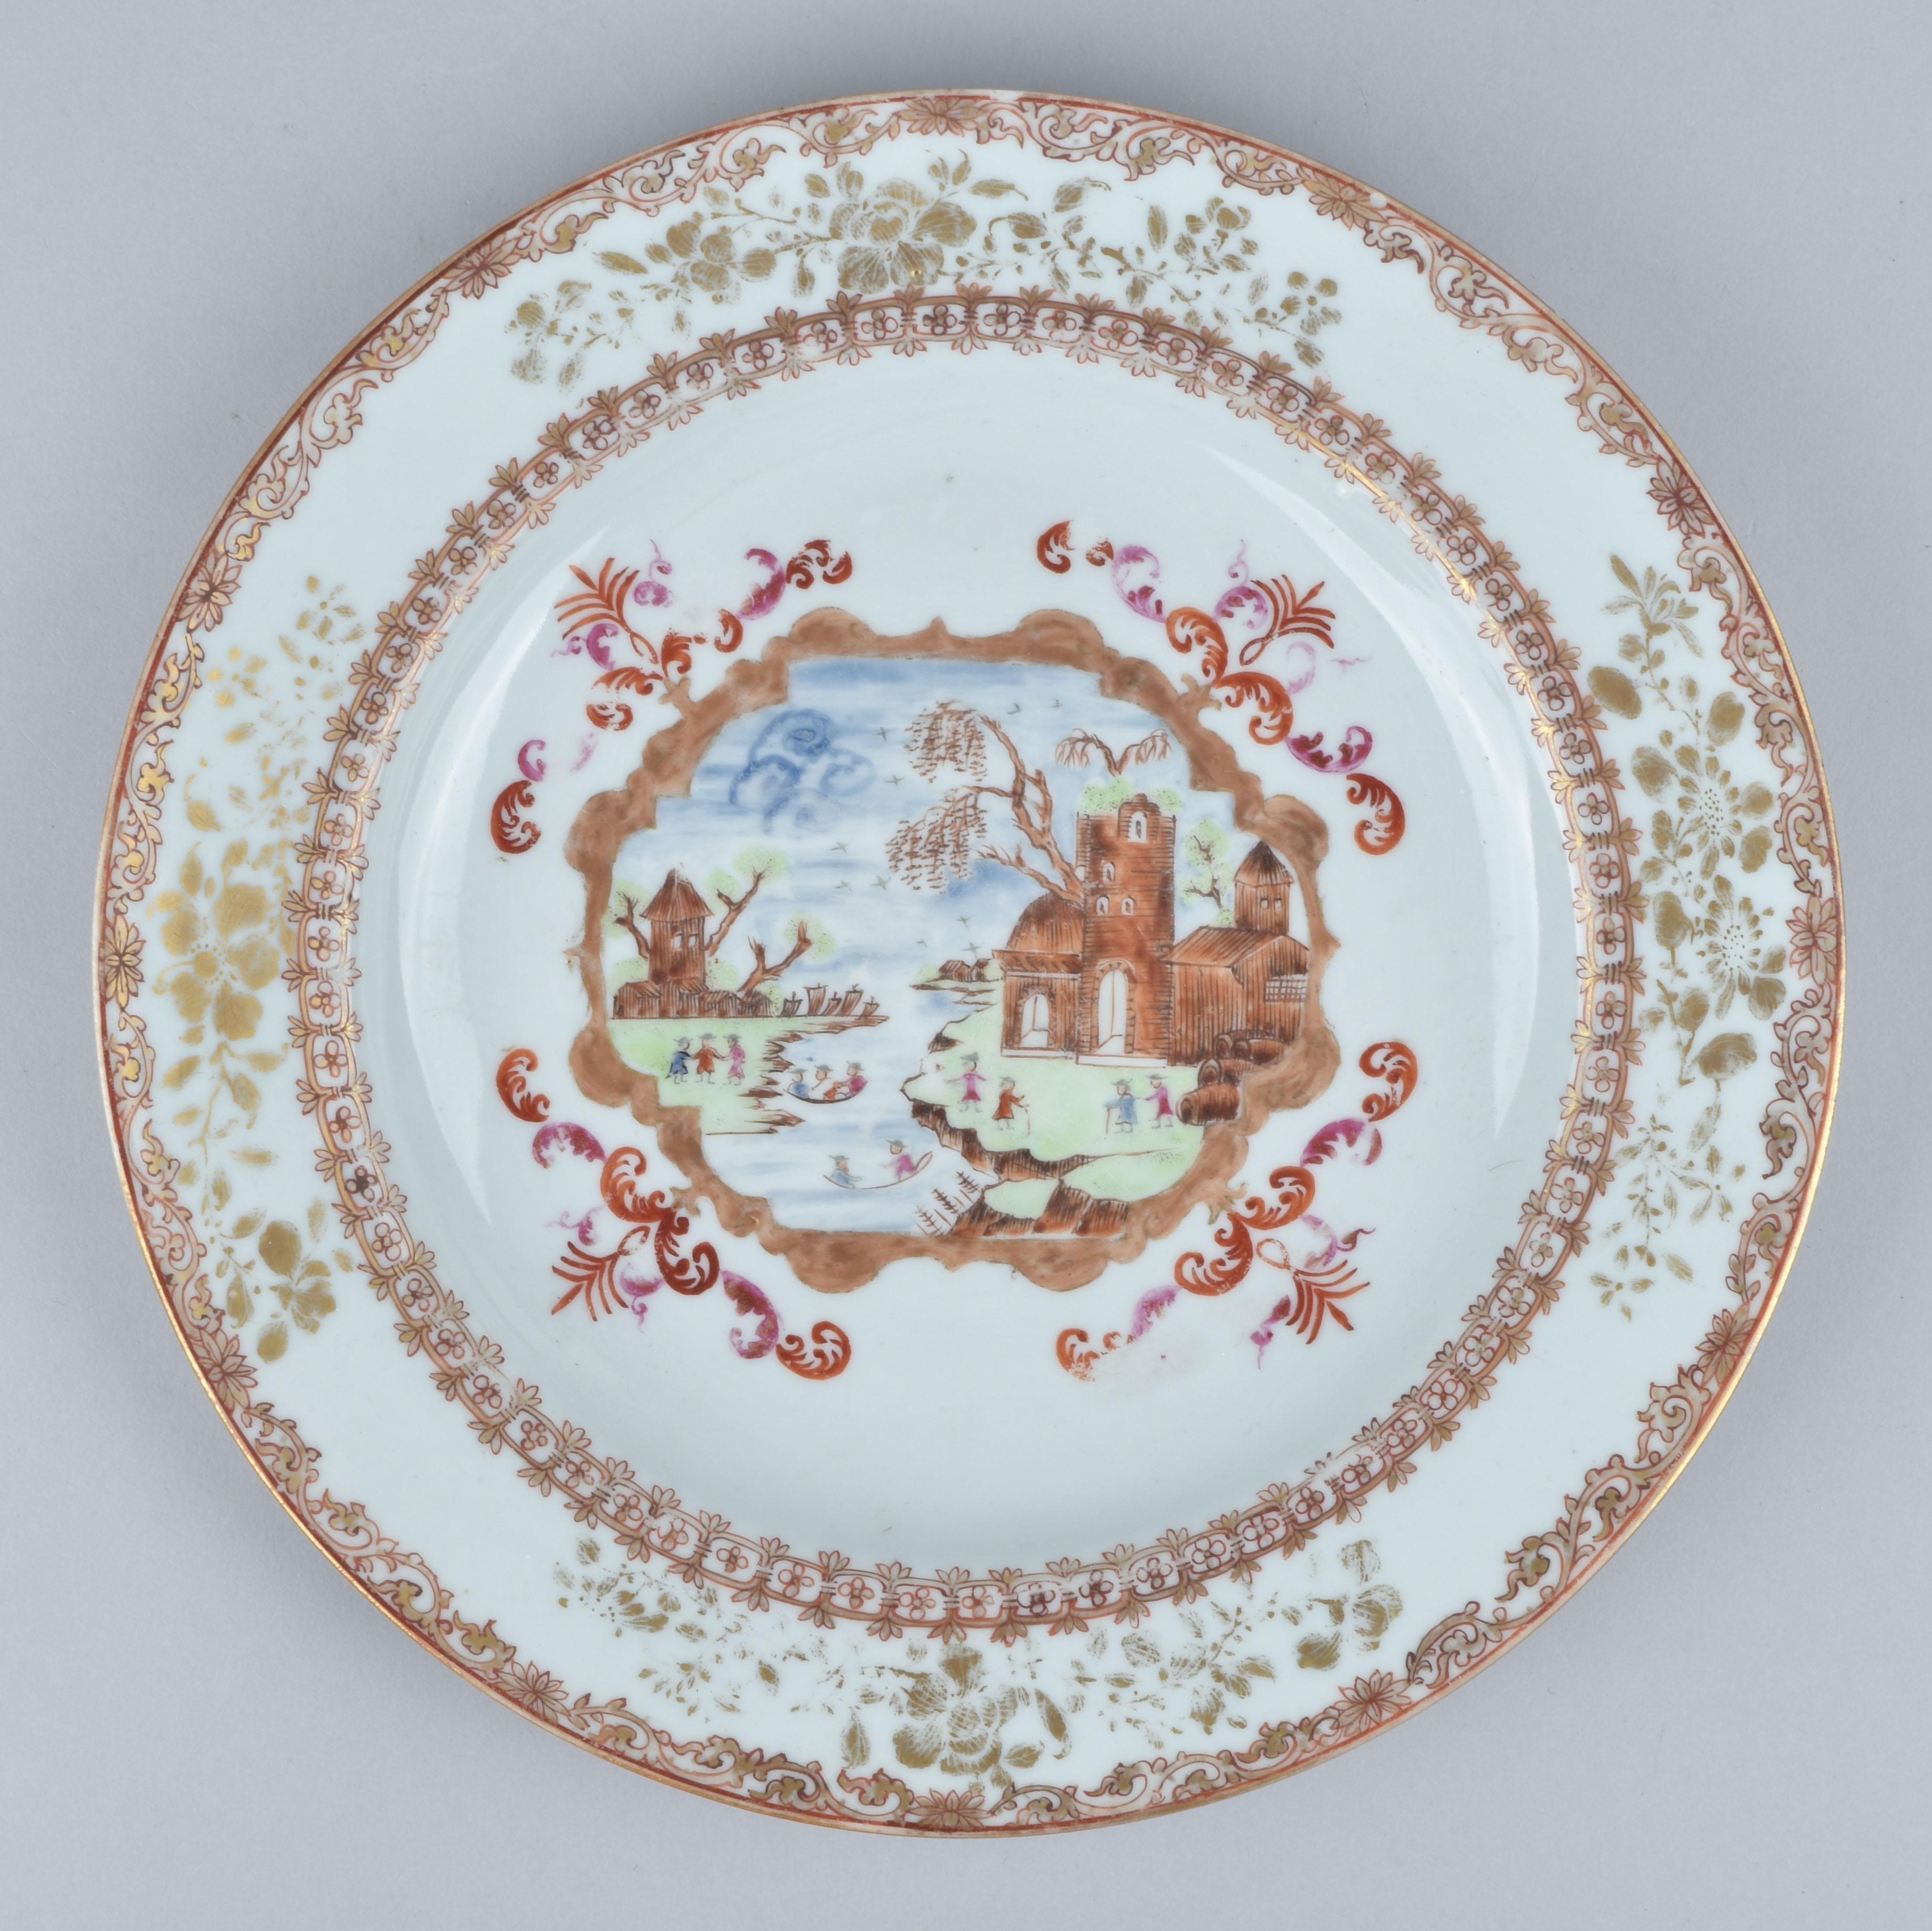 Famille rose Porcelaine Qianlong (1735-1795), ca. 1750, Chine